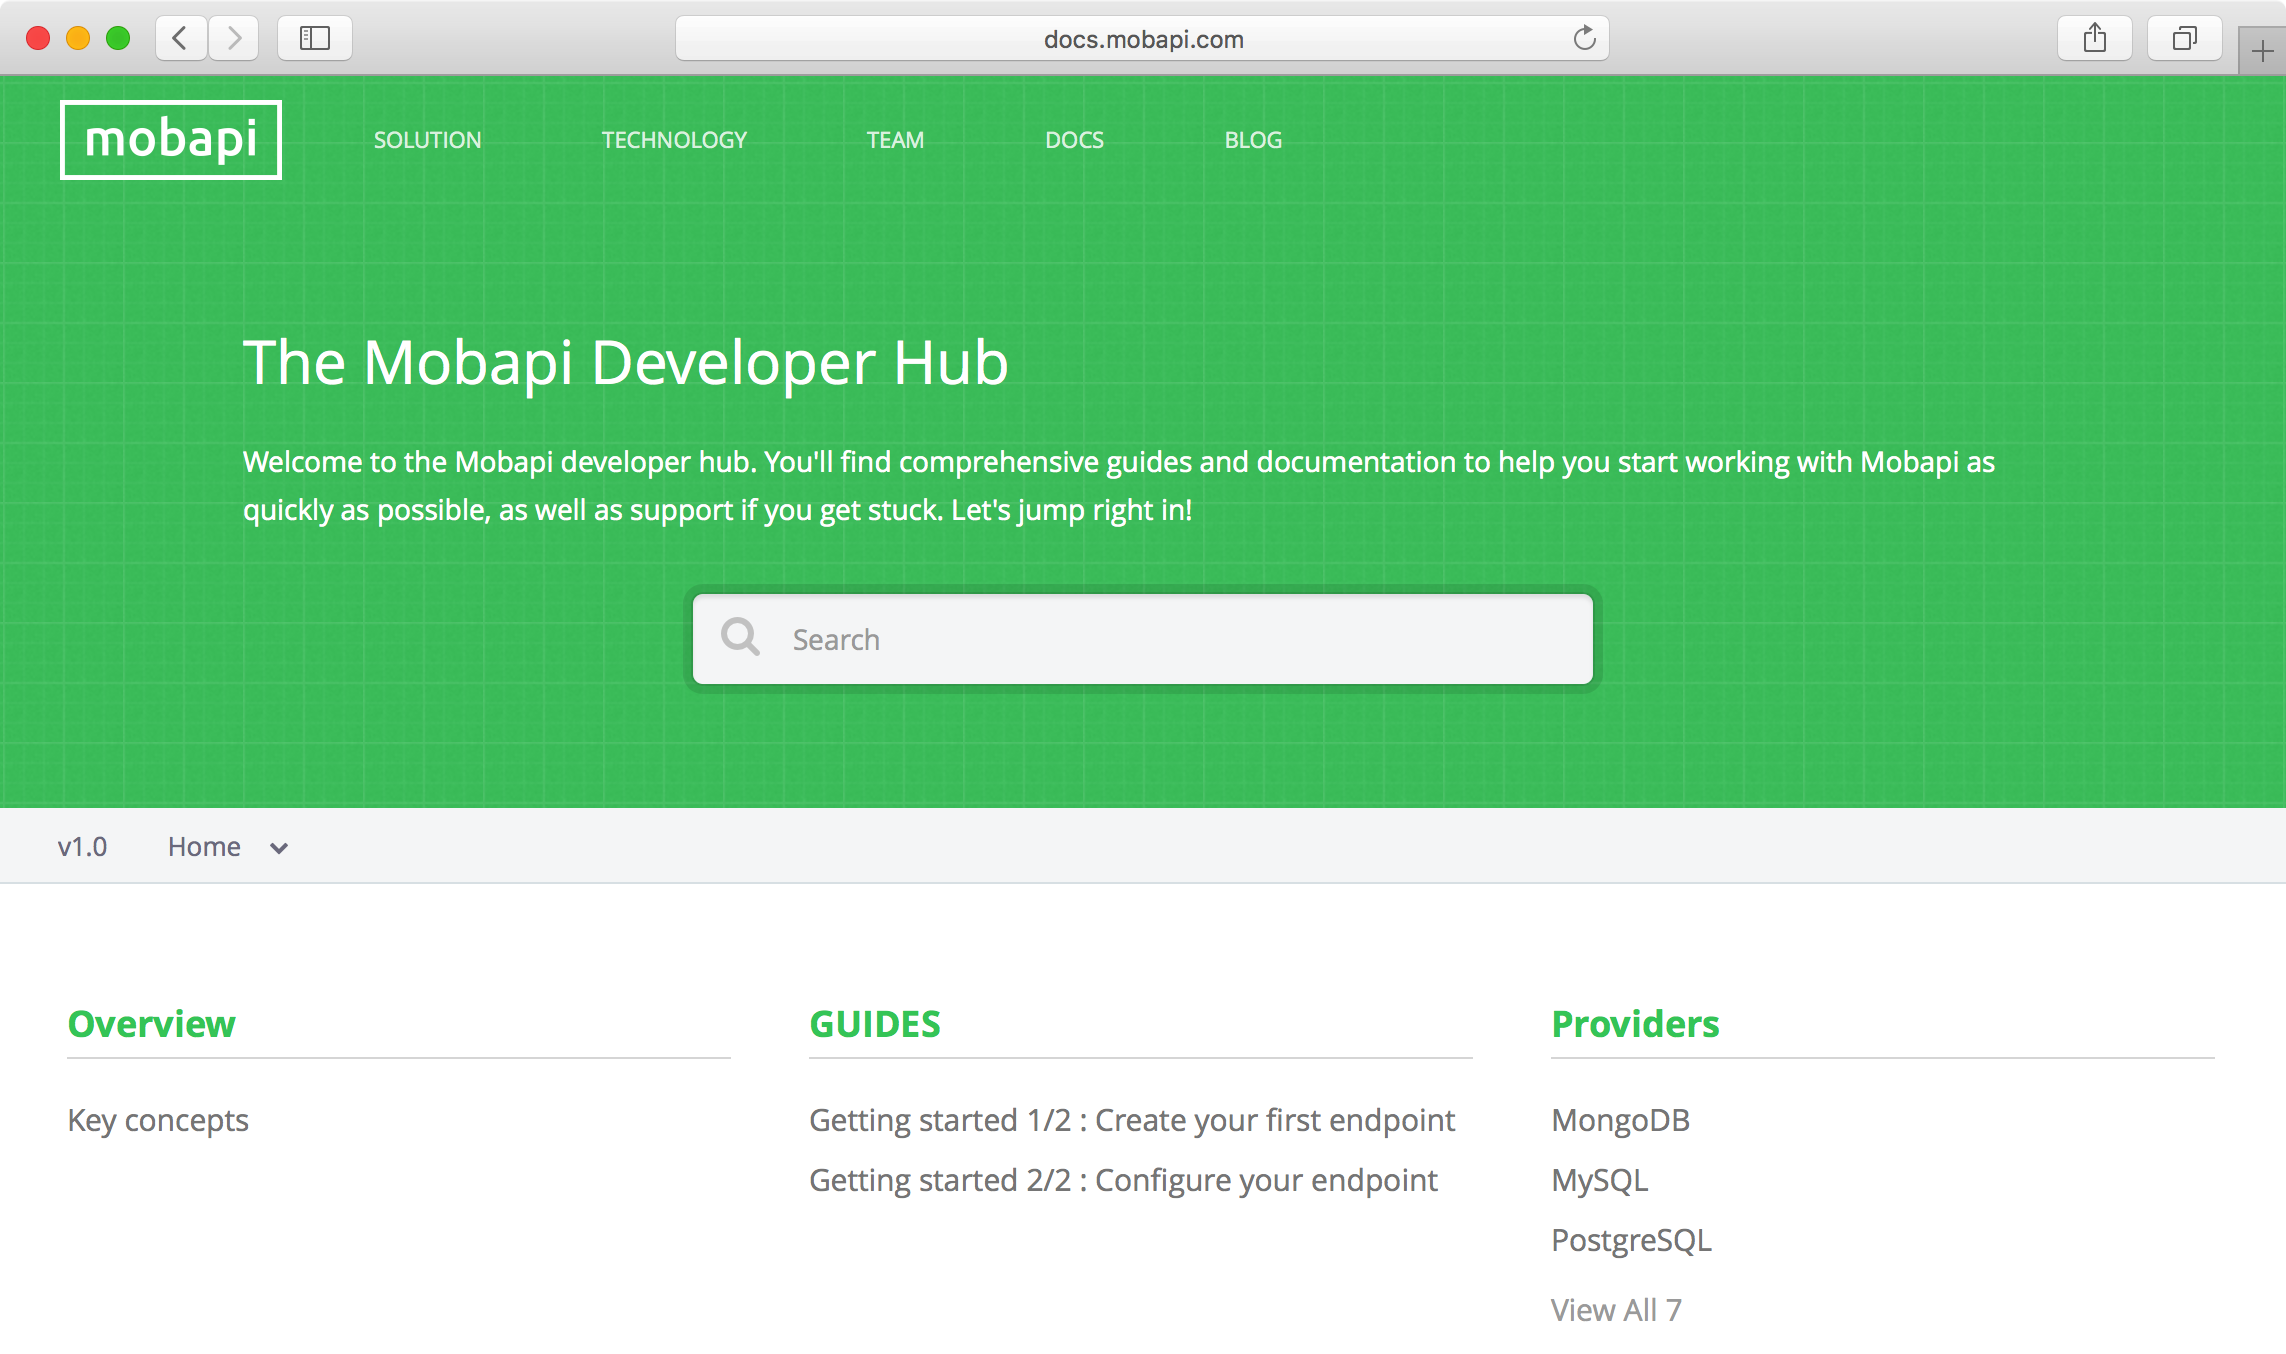 Mobapi Developer Hub